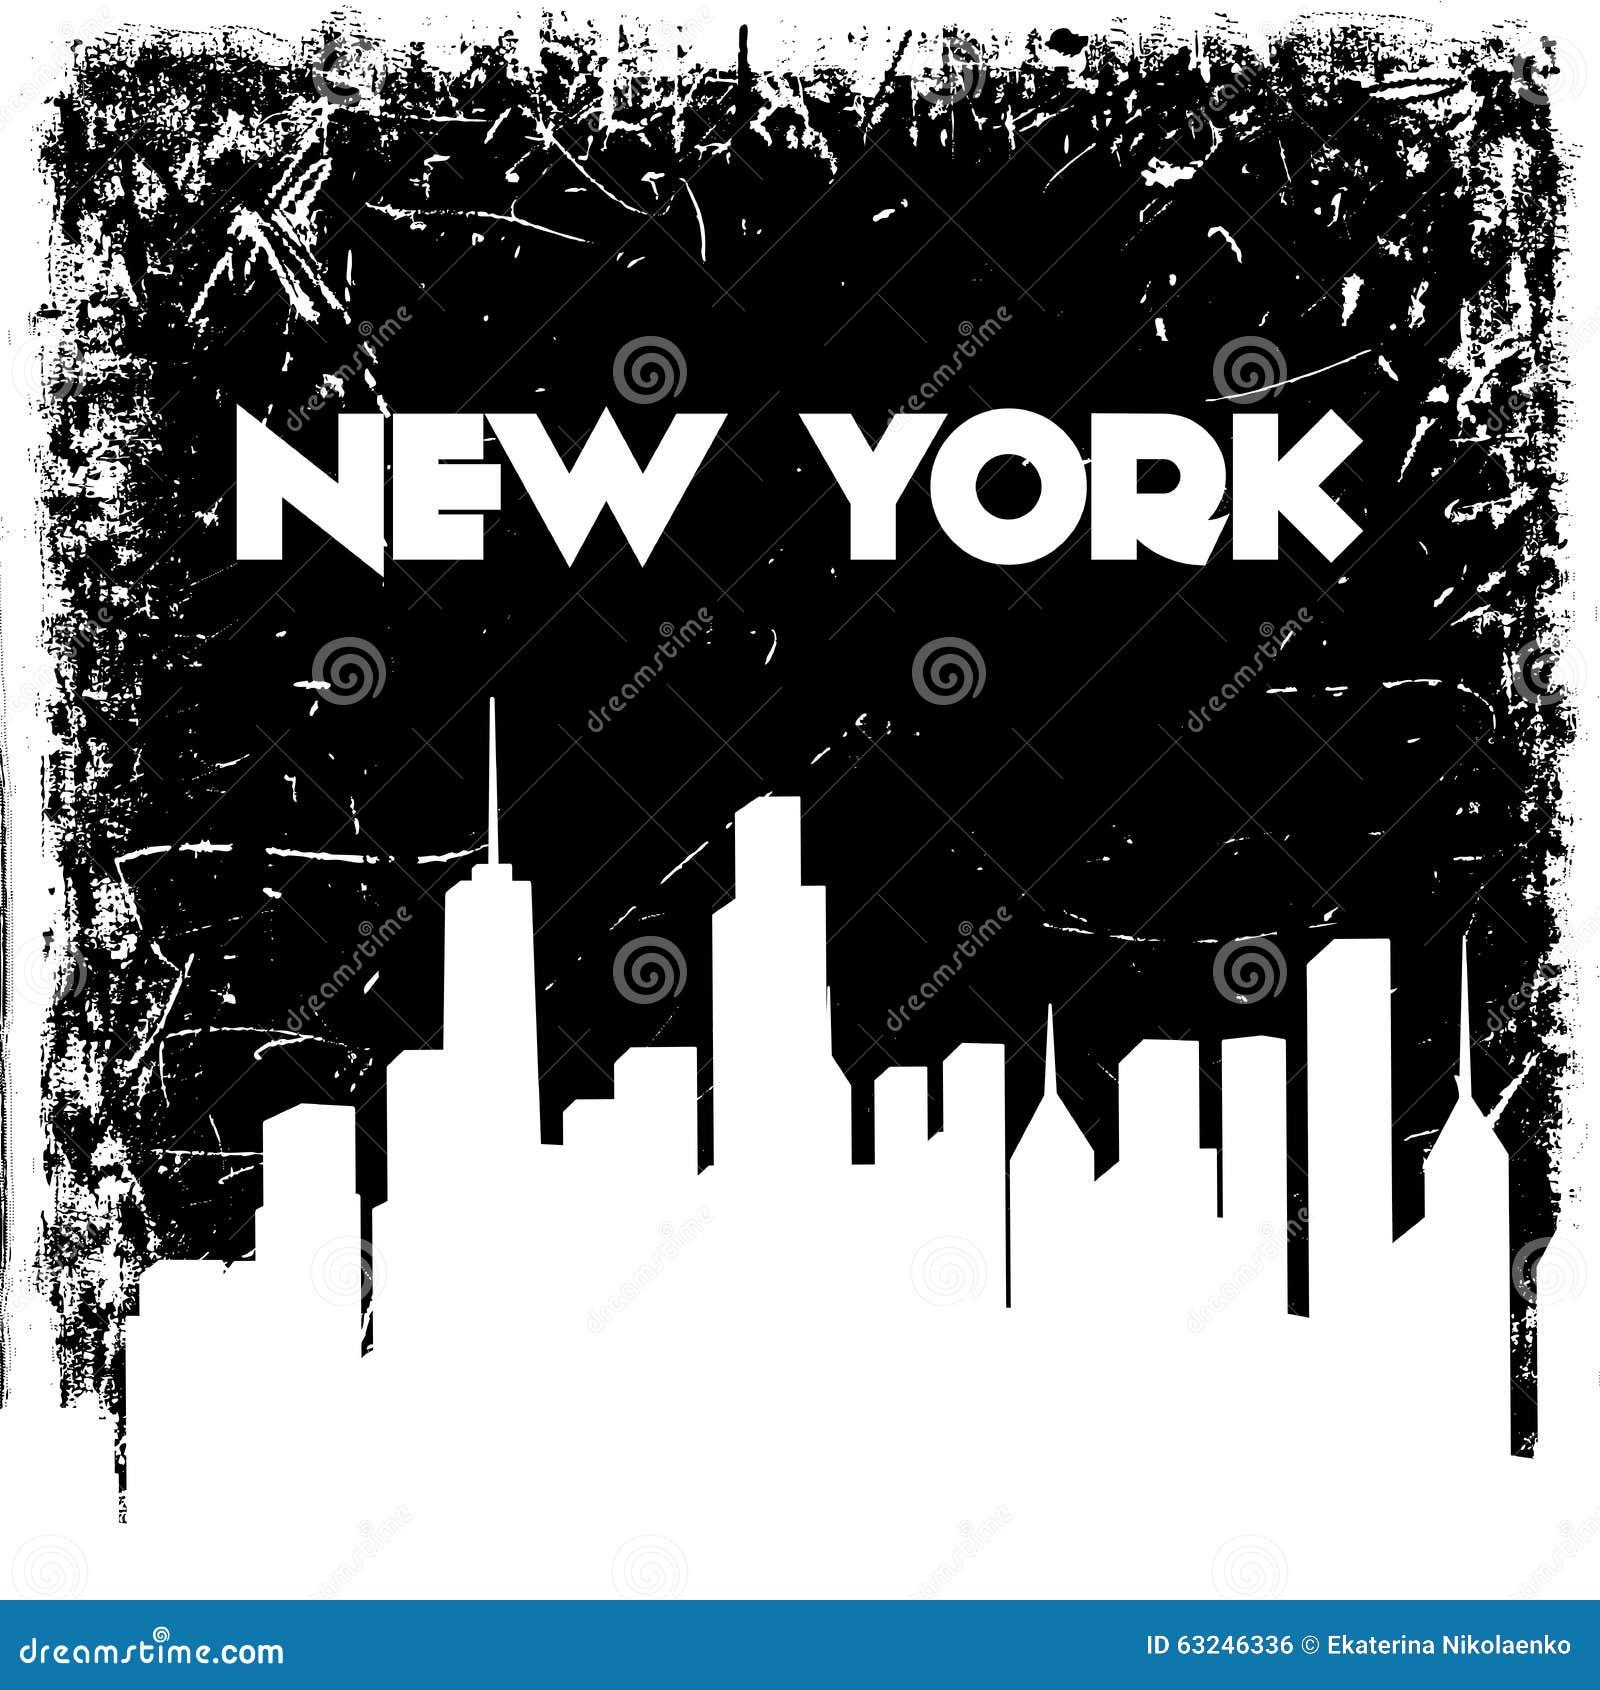 New York city skyline silhouette on grunge background. Vector hand drawn illustration.